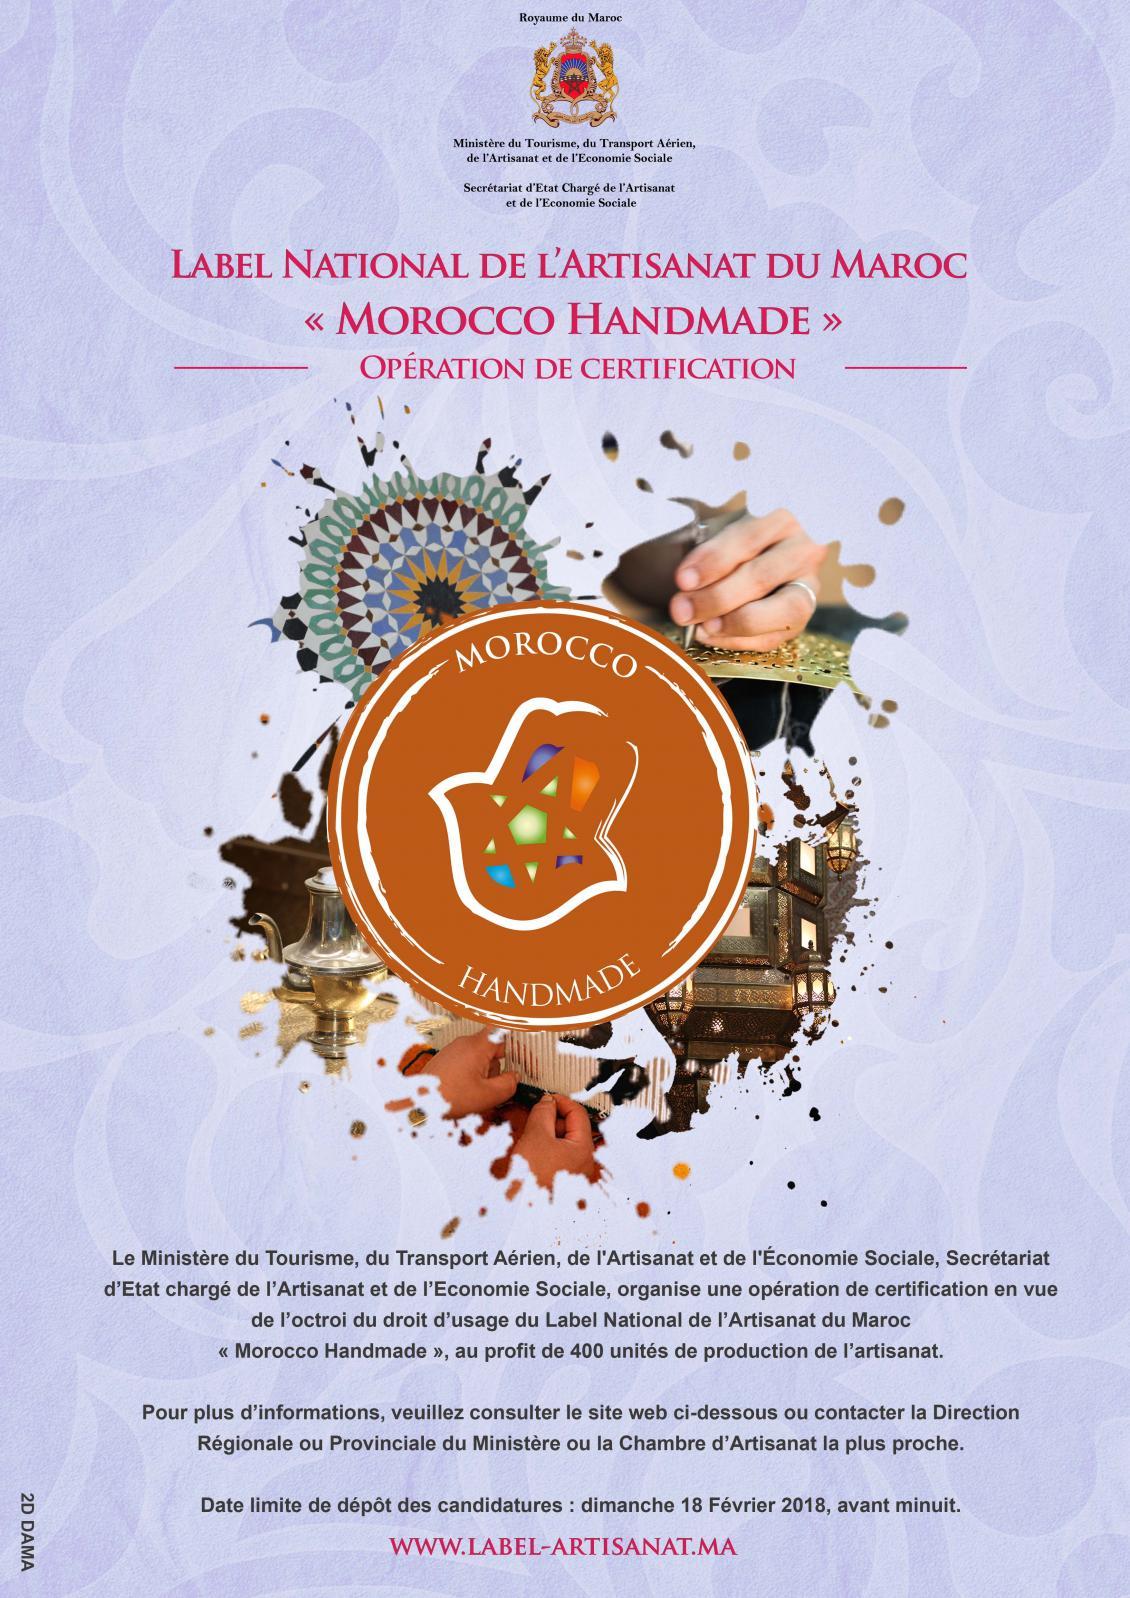 LABEL NATIONAL DE L'ARTISANAT DU MAROC « MOROCCO HANDMADE ...